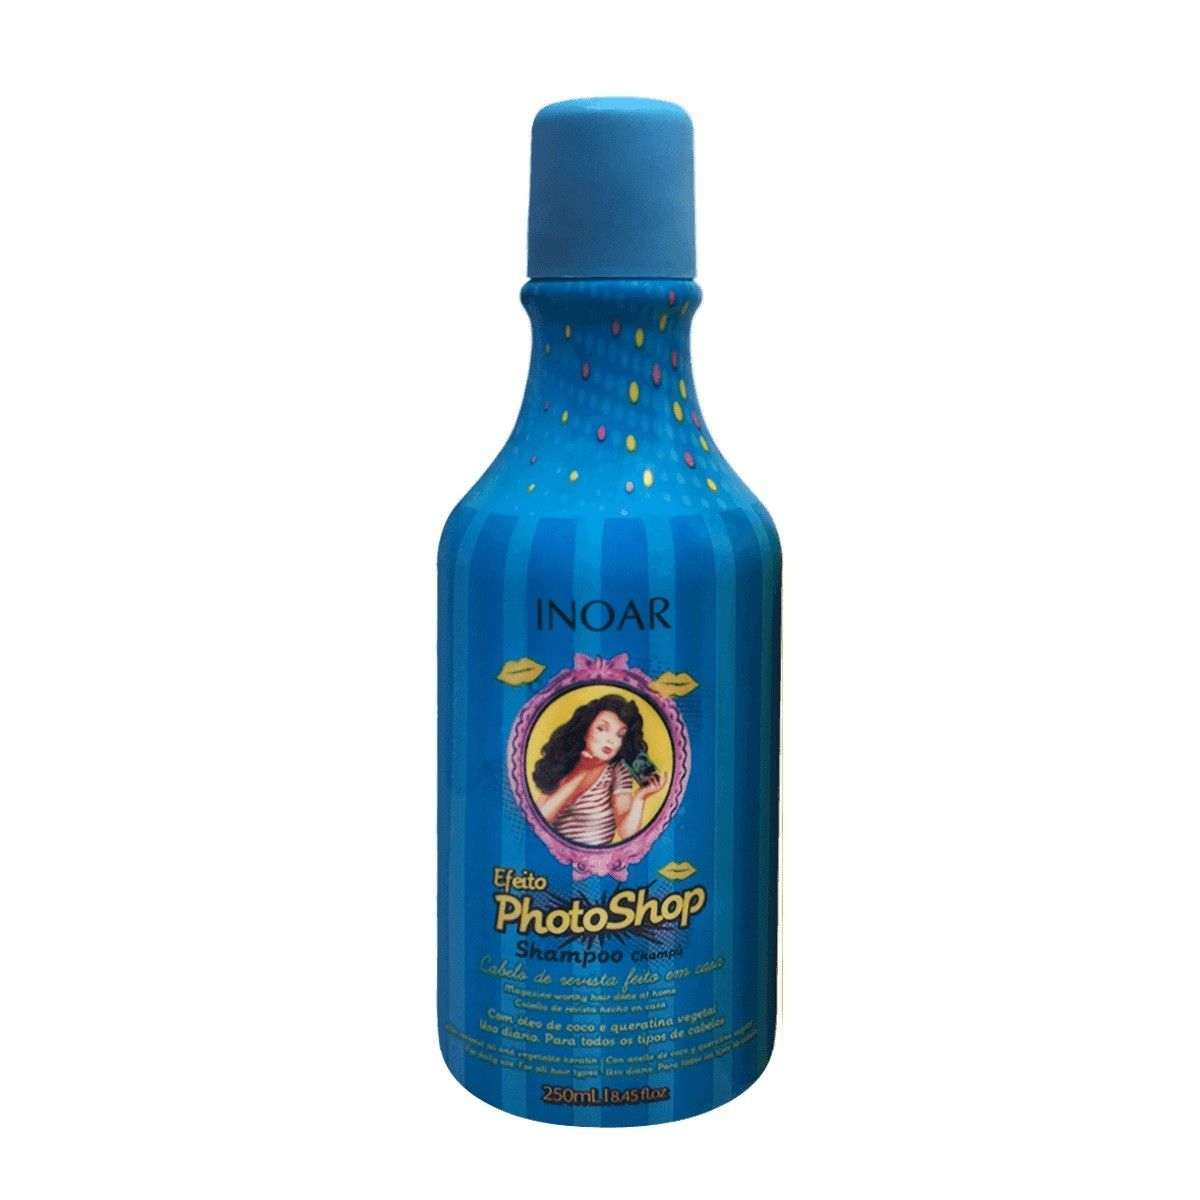 Shampoo Inoar Efeito PhotoShop - 250ml